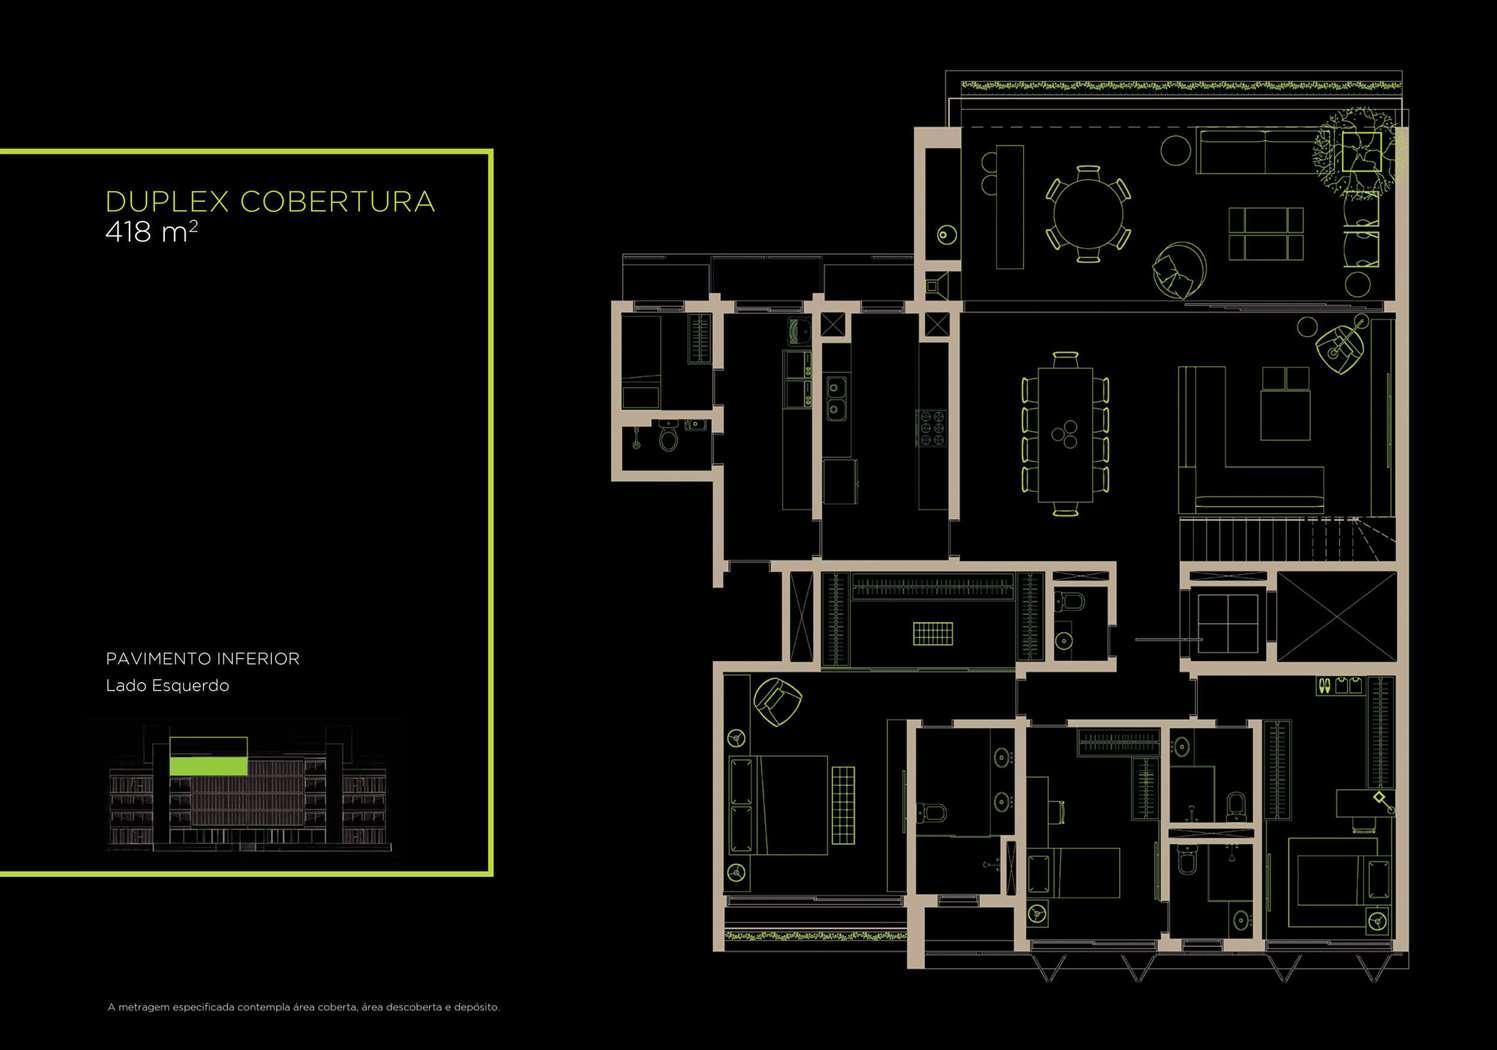 Duplex Cobertura 418m²   Inferior